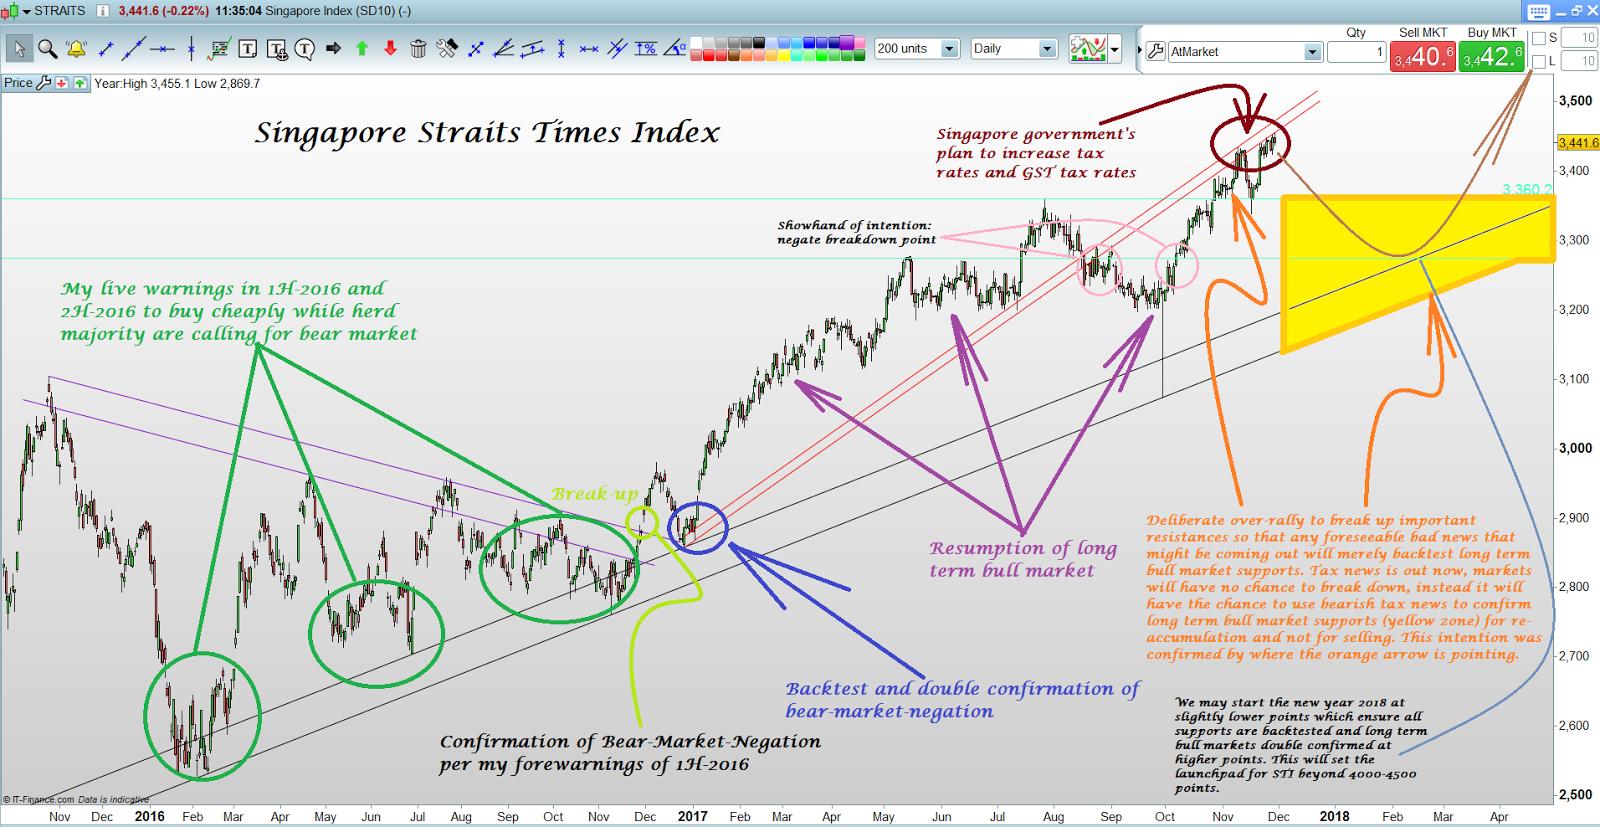 Donovan Norfolk's Market Analysis: Singapore Straits Times Index: What to expect next?